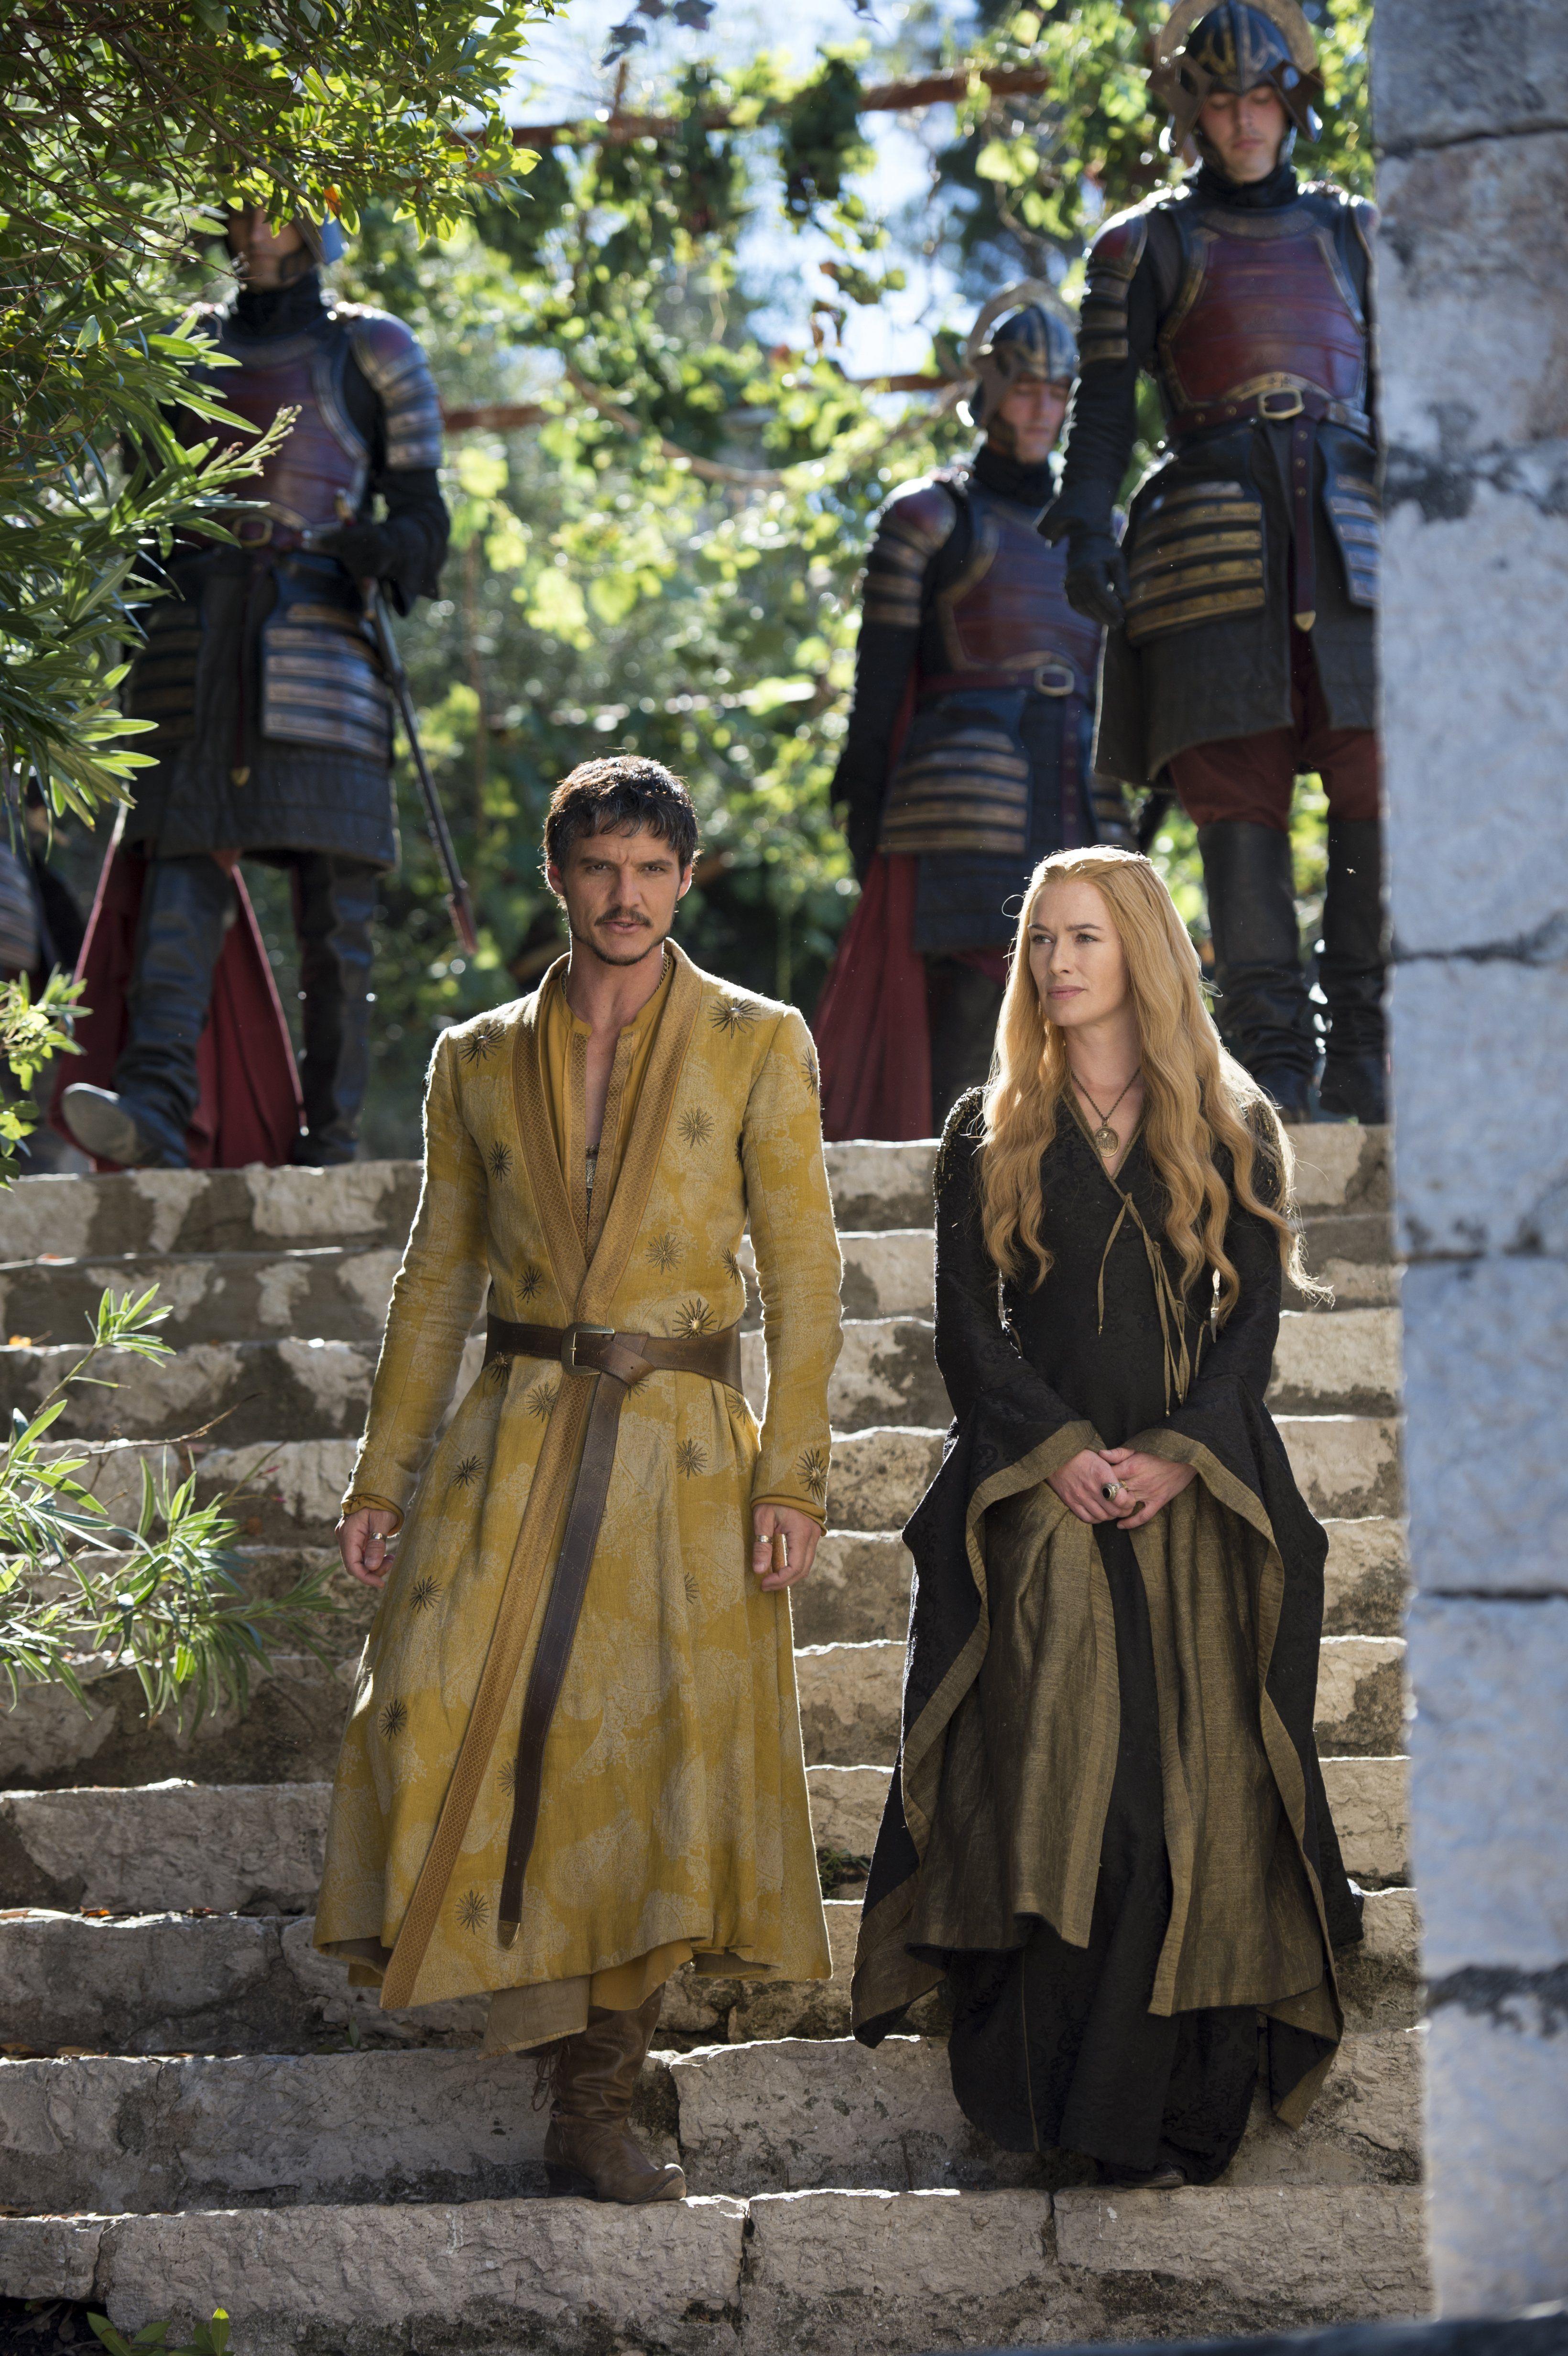 Game of Thrones Season 4 Episode 5 Still I love both